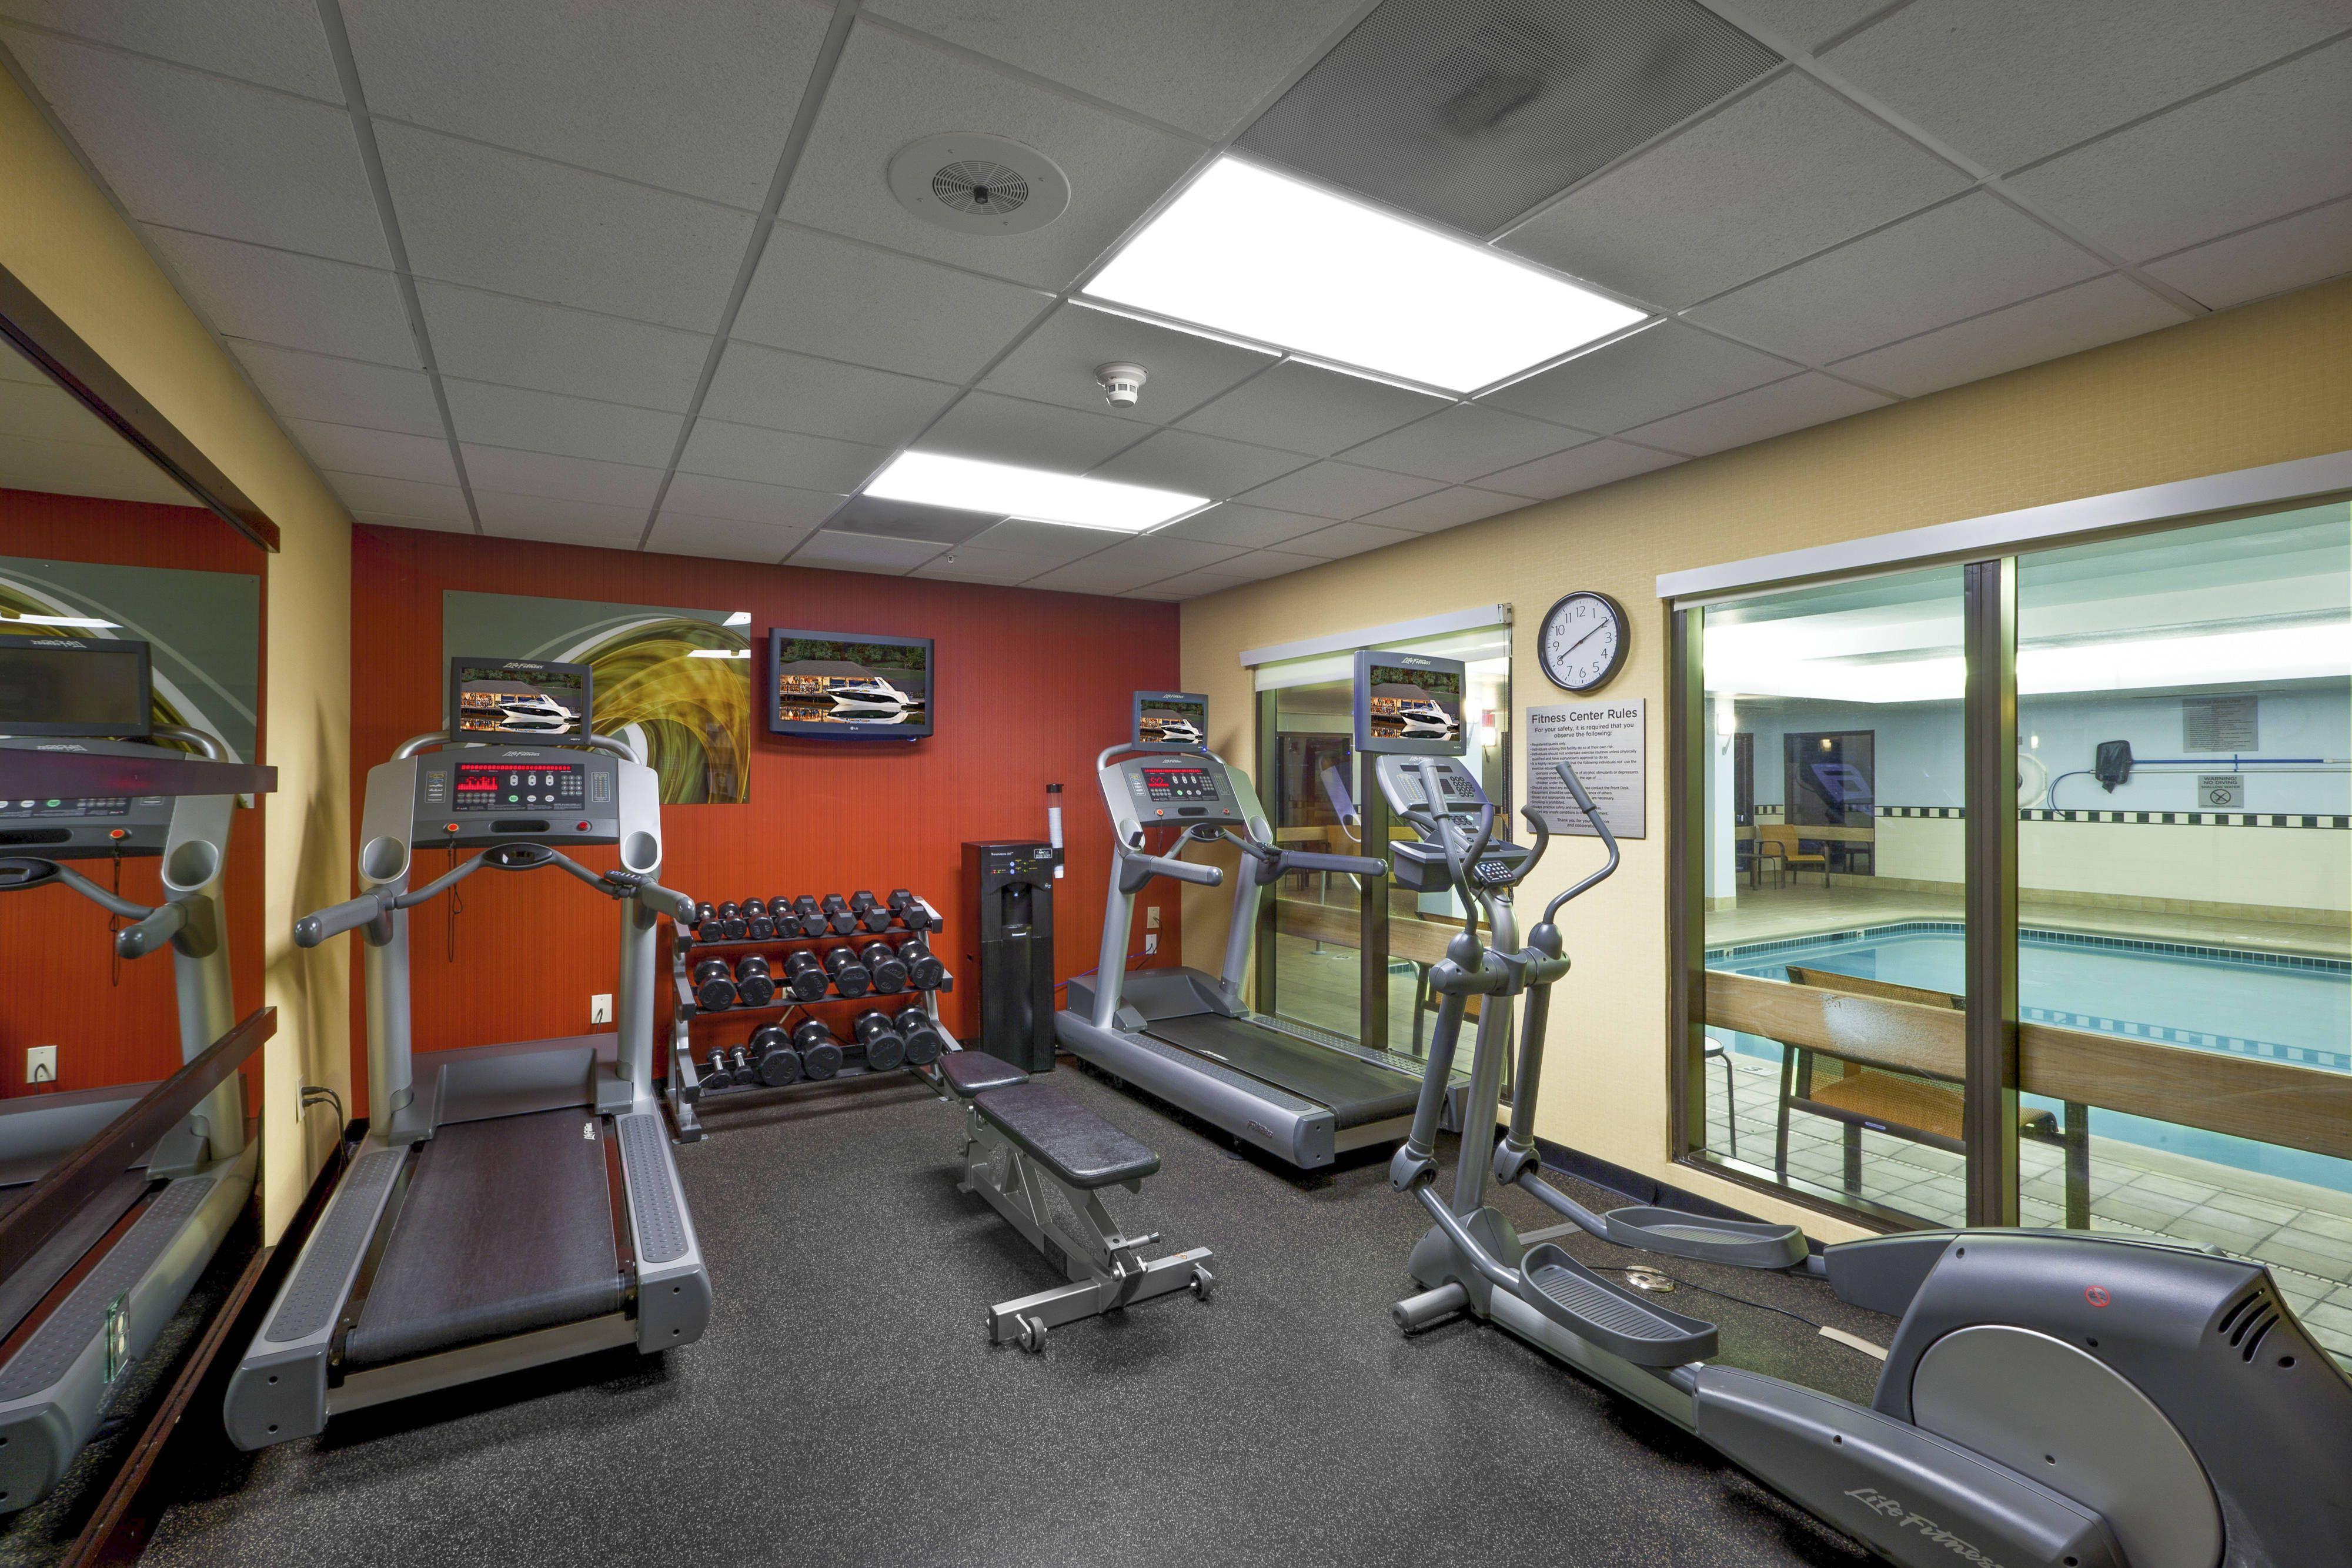 Courtyard baton rouge siegen lane fitness center holiday